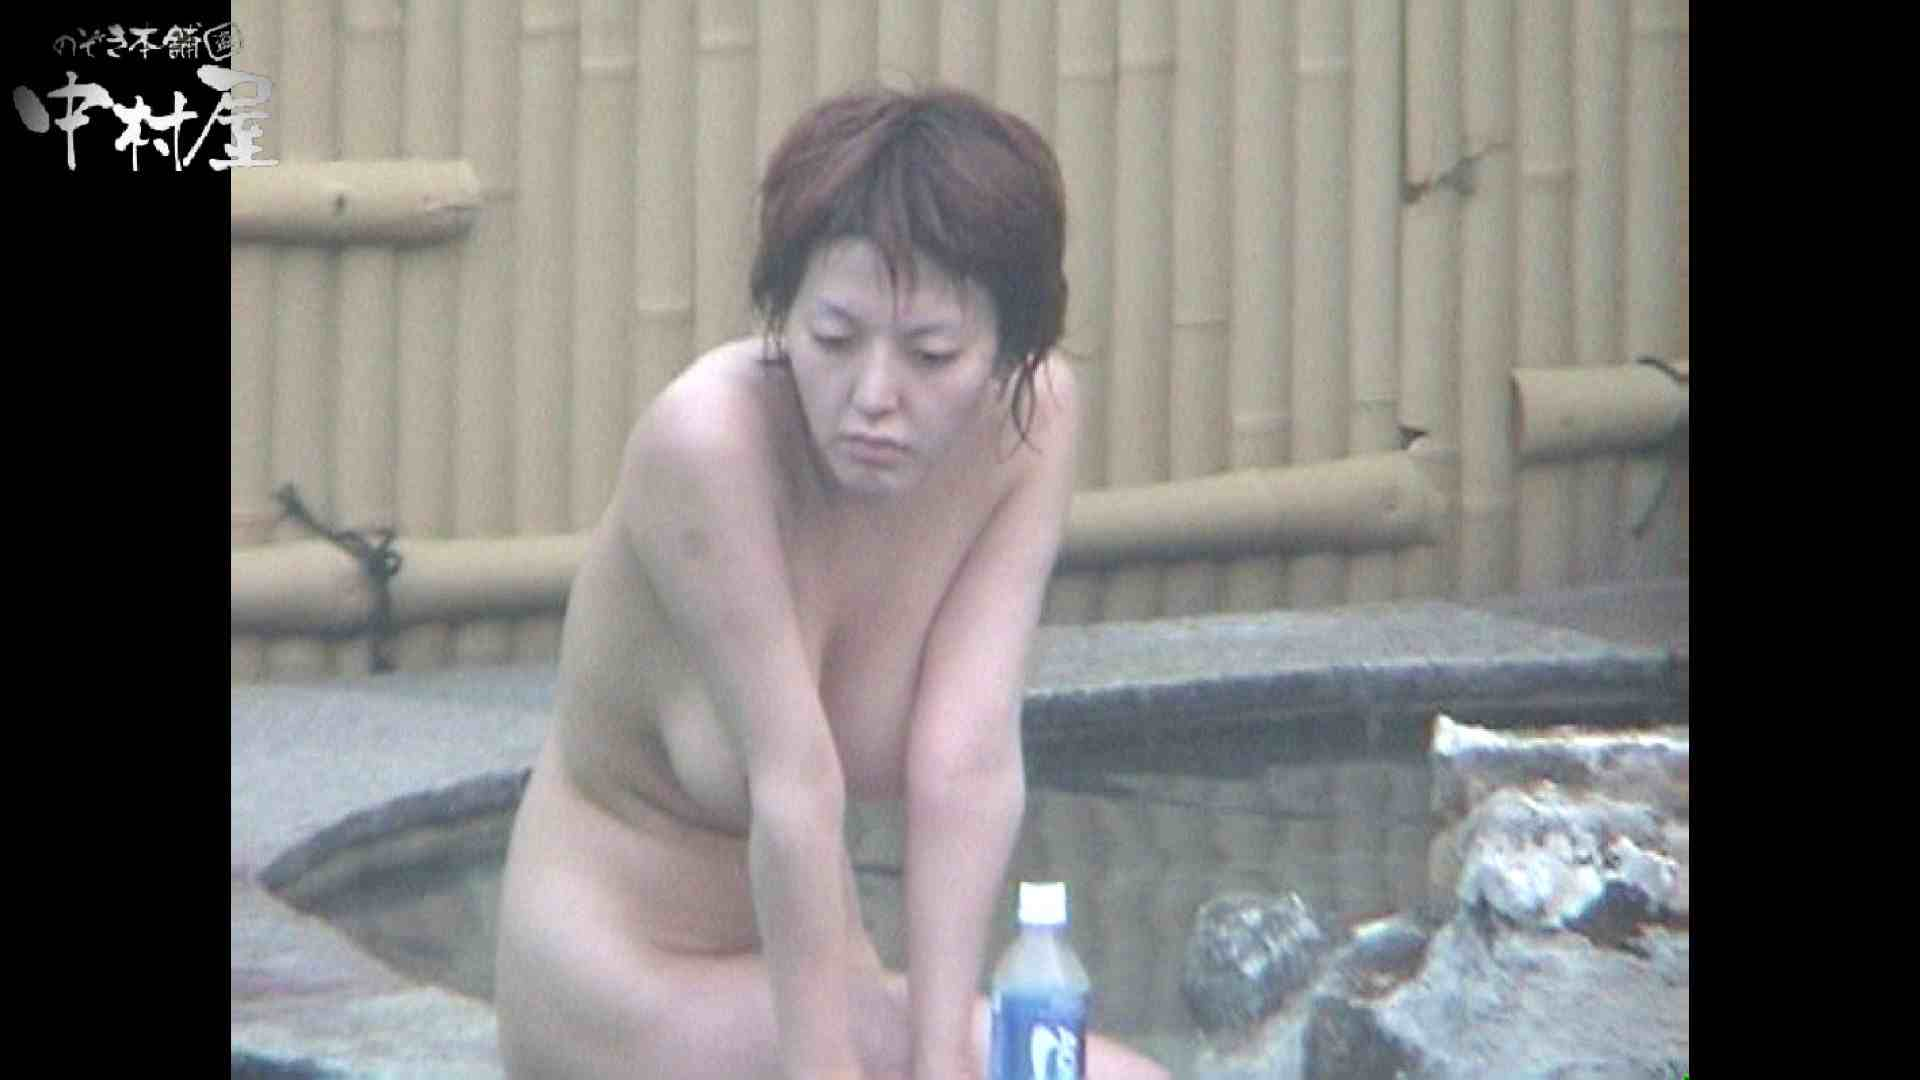 Aquaな露天風呂Vol.959 盗撮シリーズ | 露天風呂編  80PIX 65